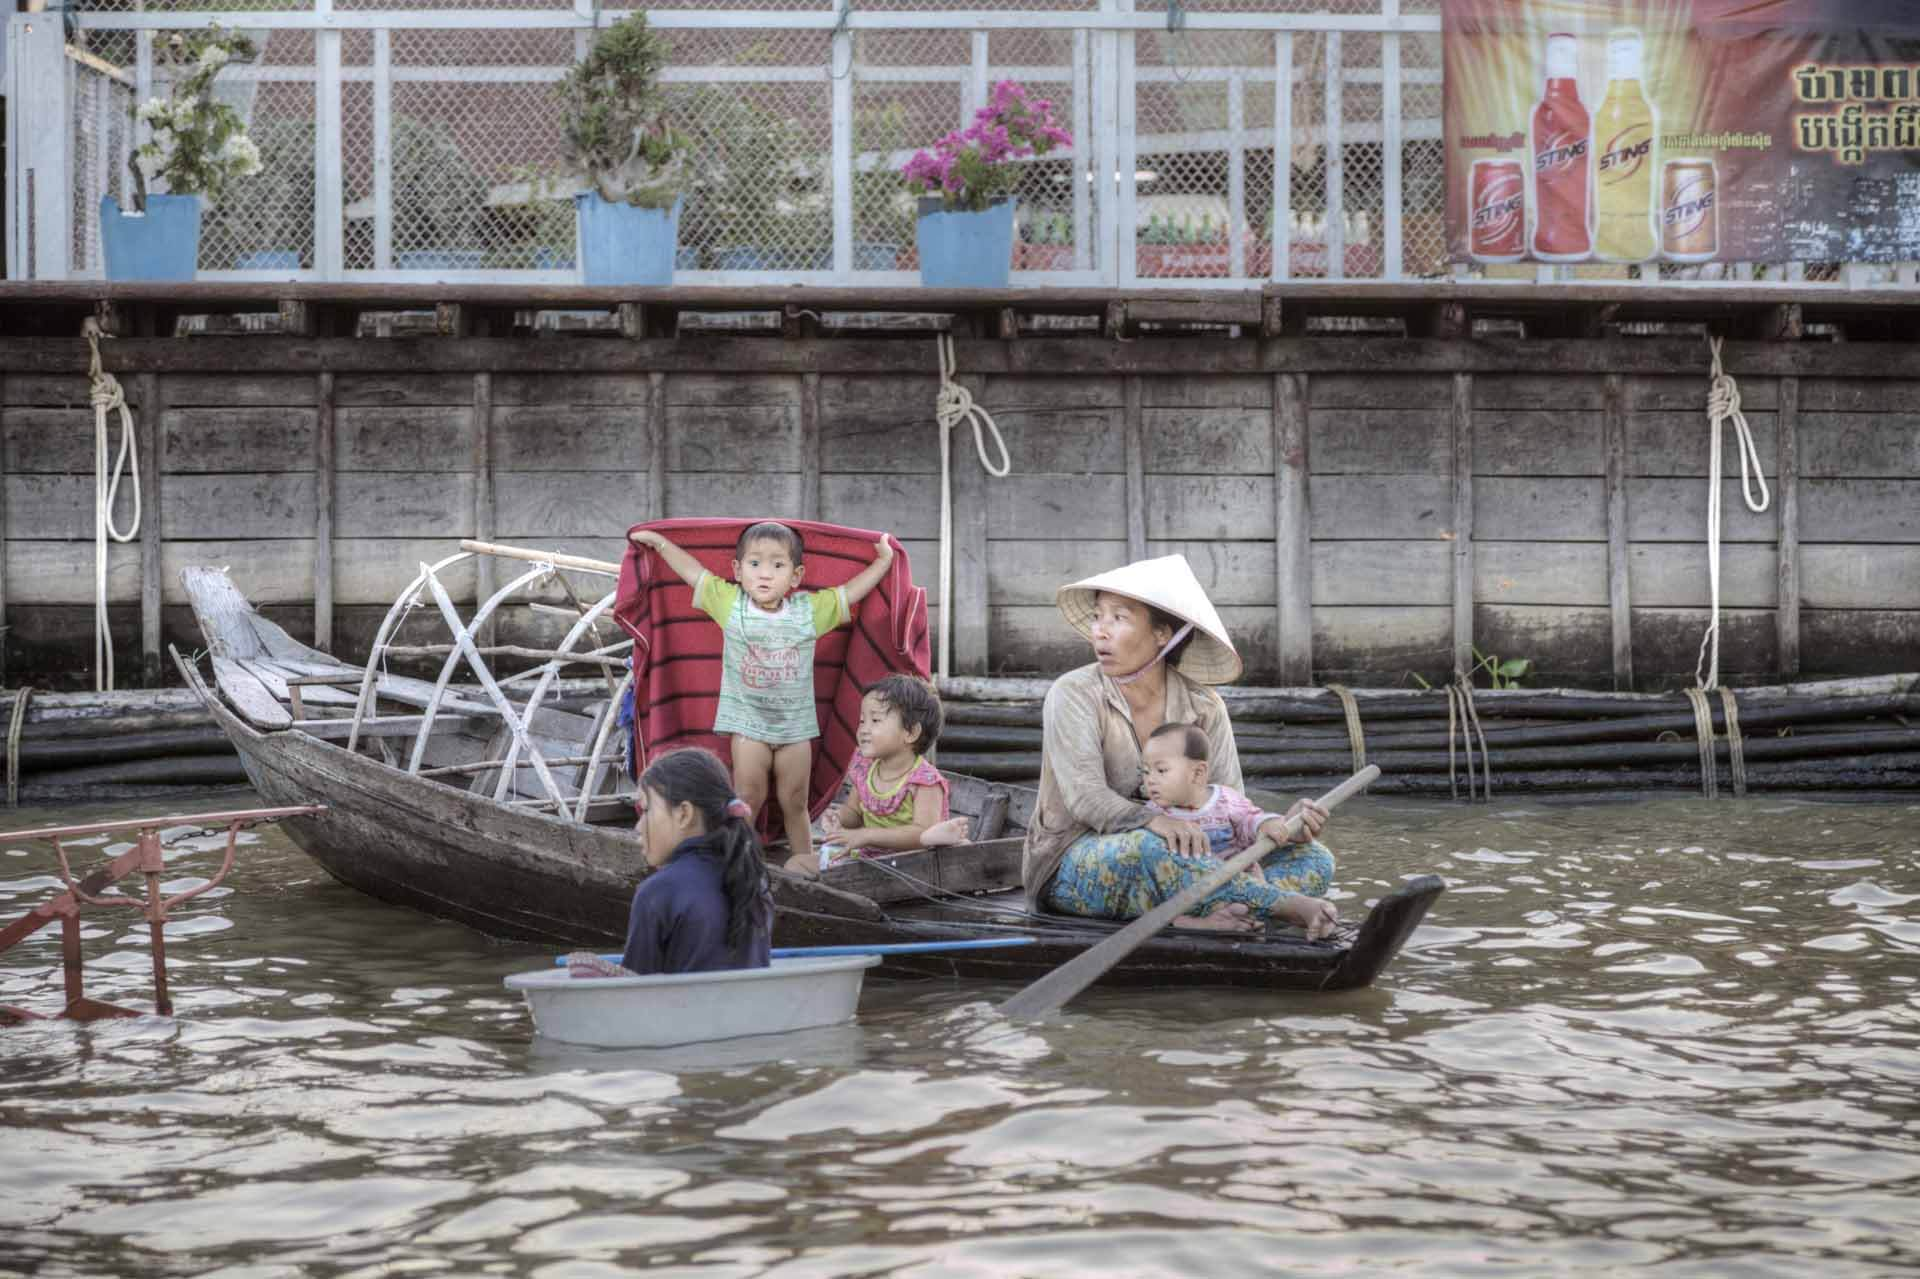 Boat People: Familie auf einem Kanu am Tonle-Sap-See in Kambodscha